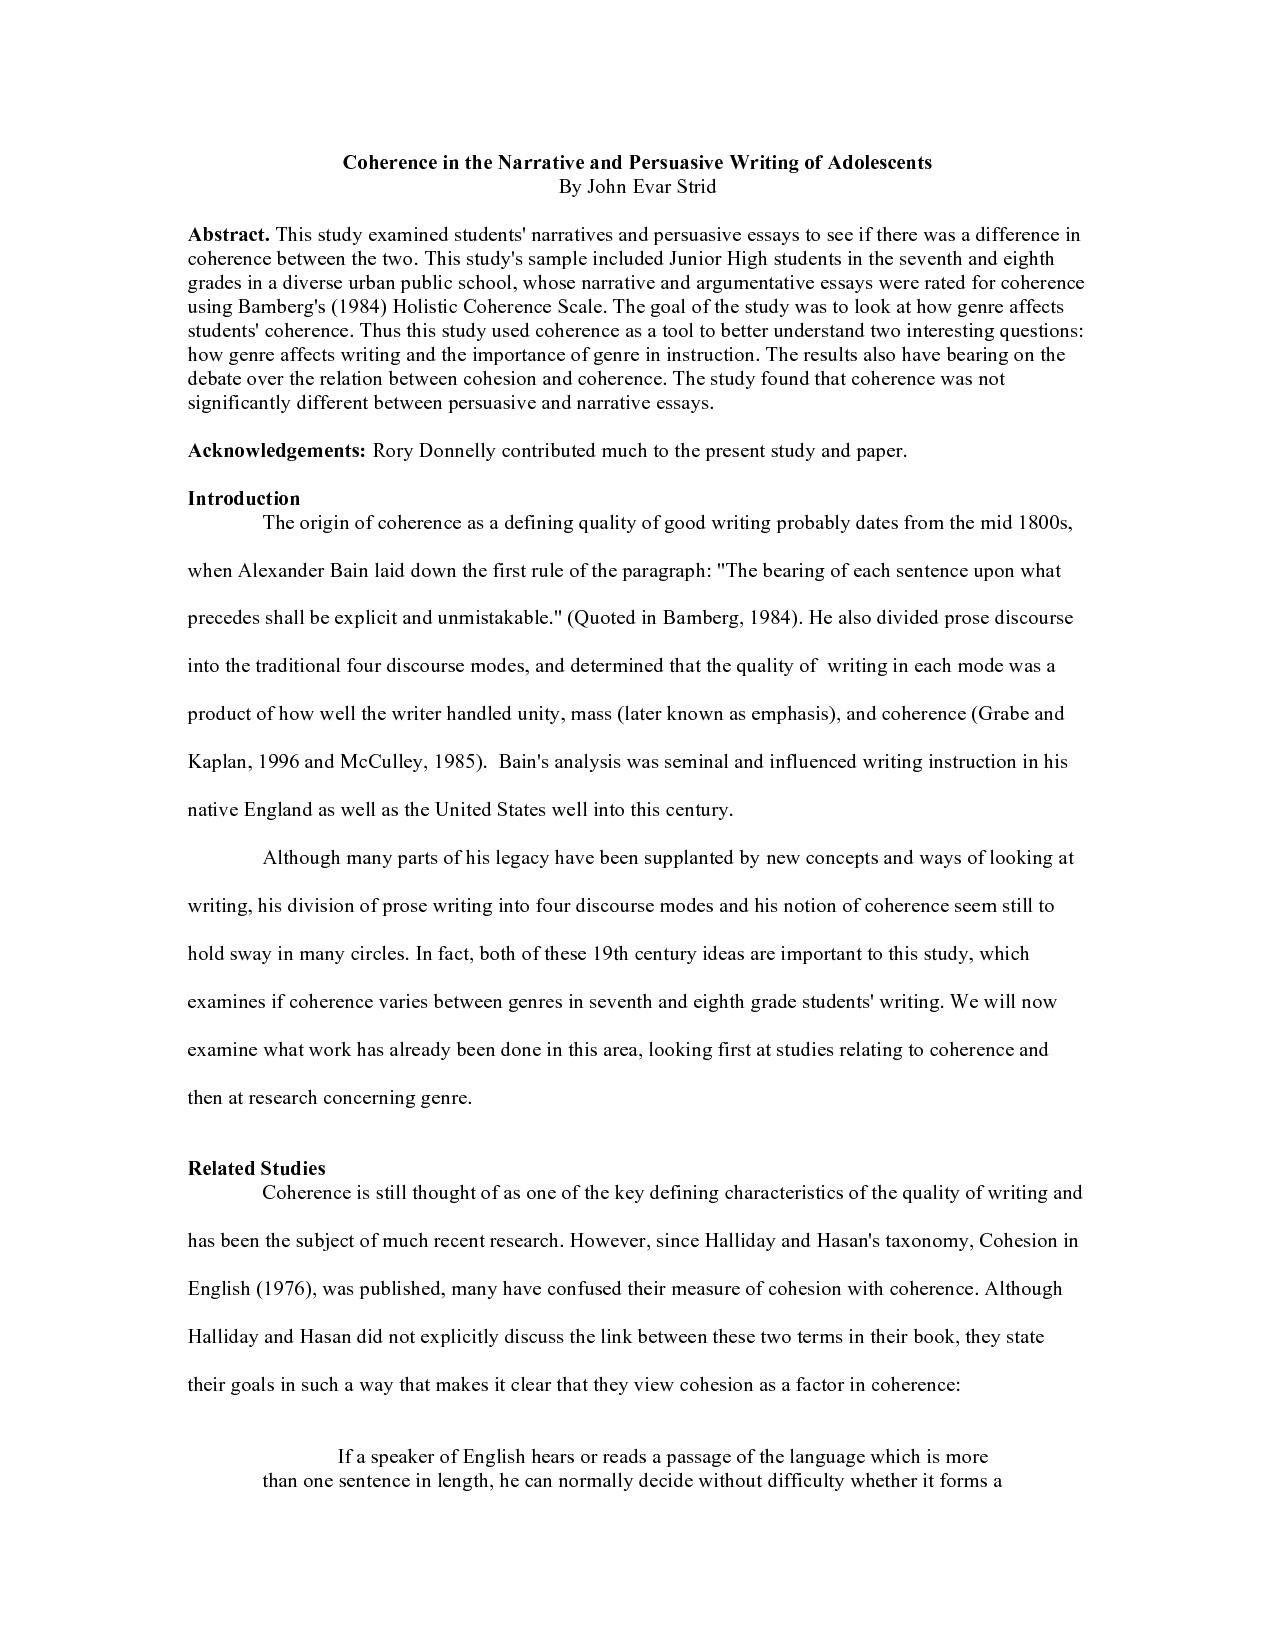 Sample Argumentative Essay Middle School